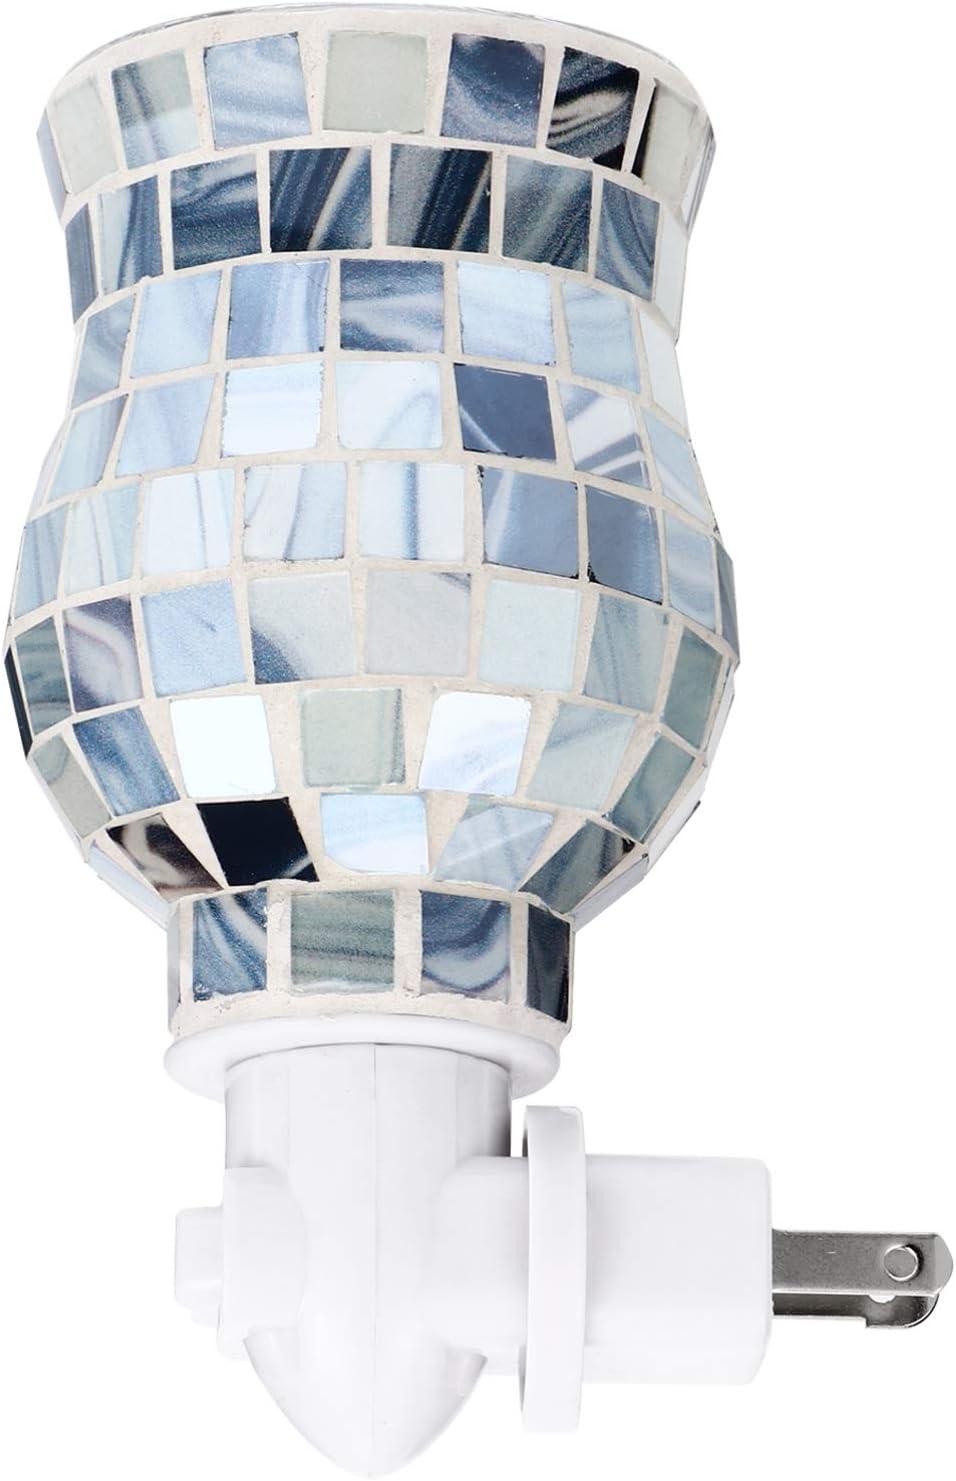 Uonlytech Plug- in Fragrance Wax Melt Warmers Glass Mosaic Oil Warmer Home Fragrance Diffuser Night Lamp Blue